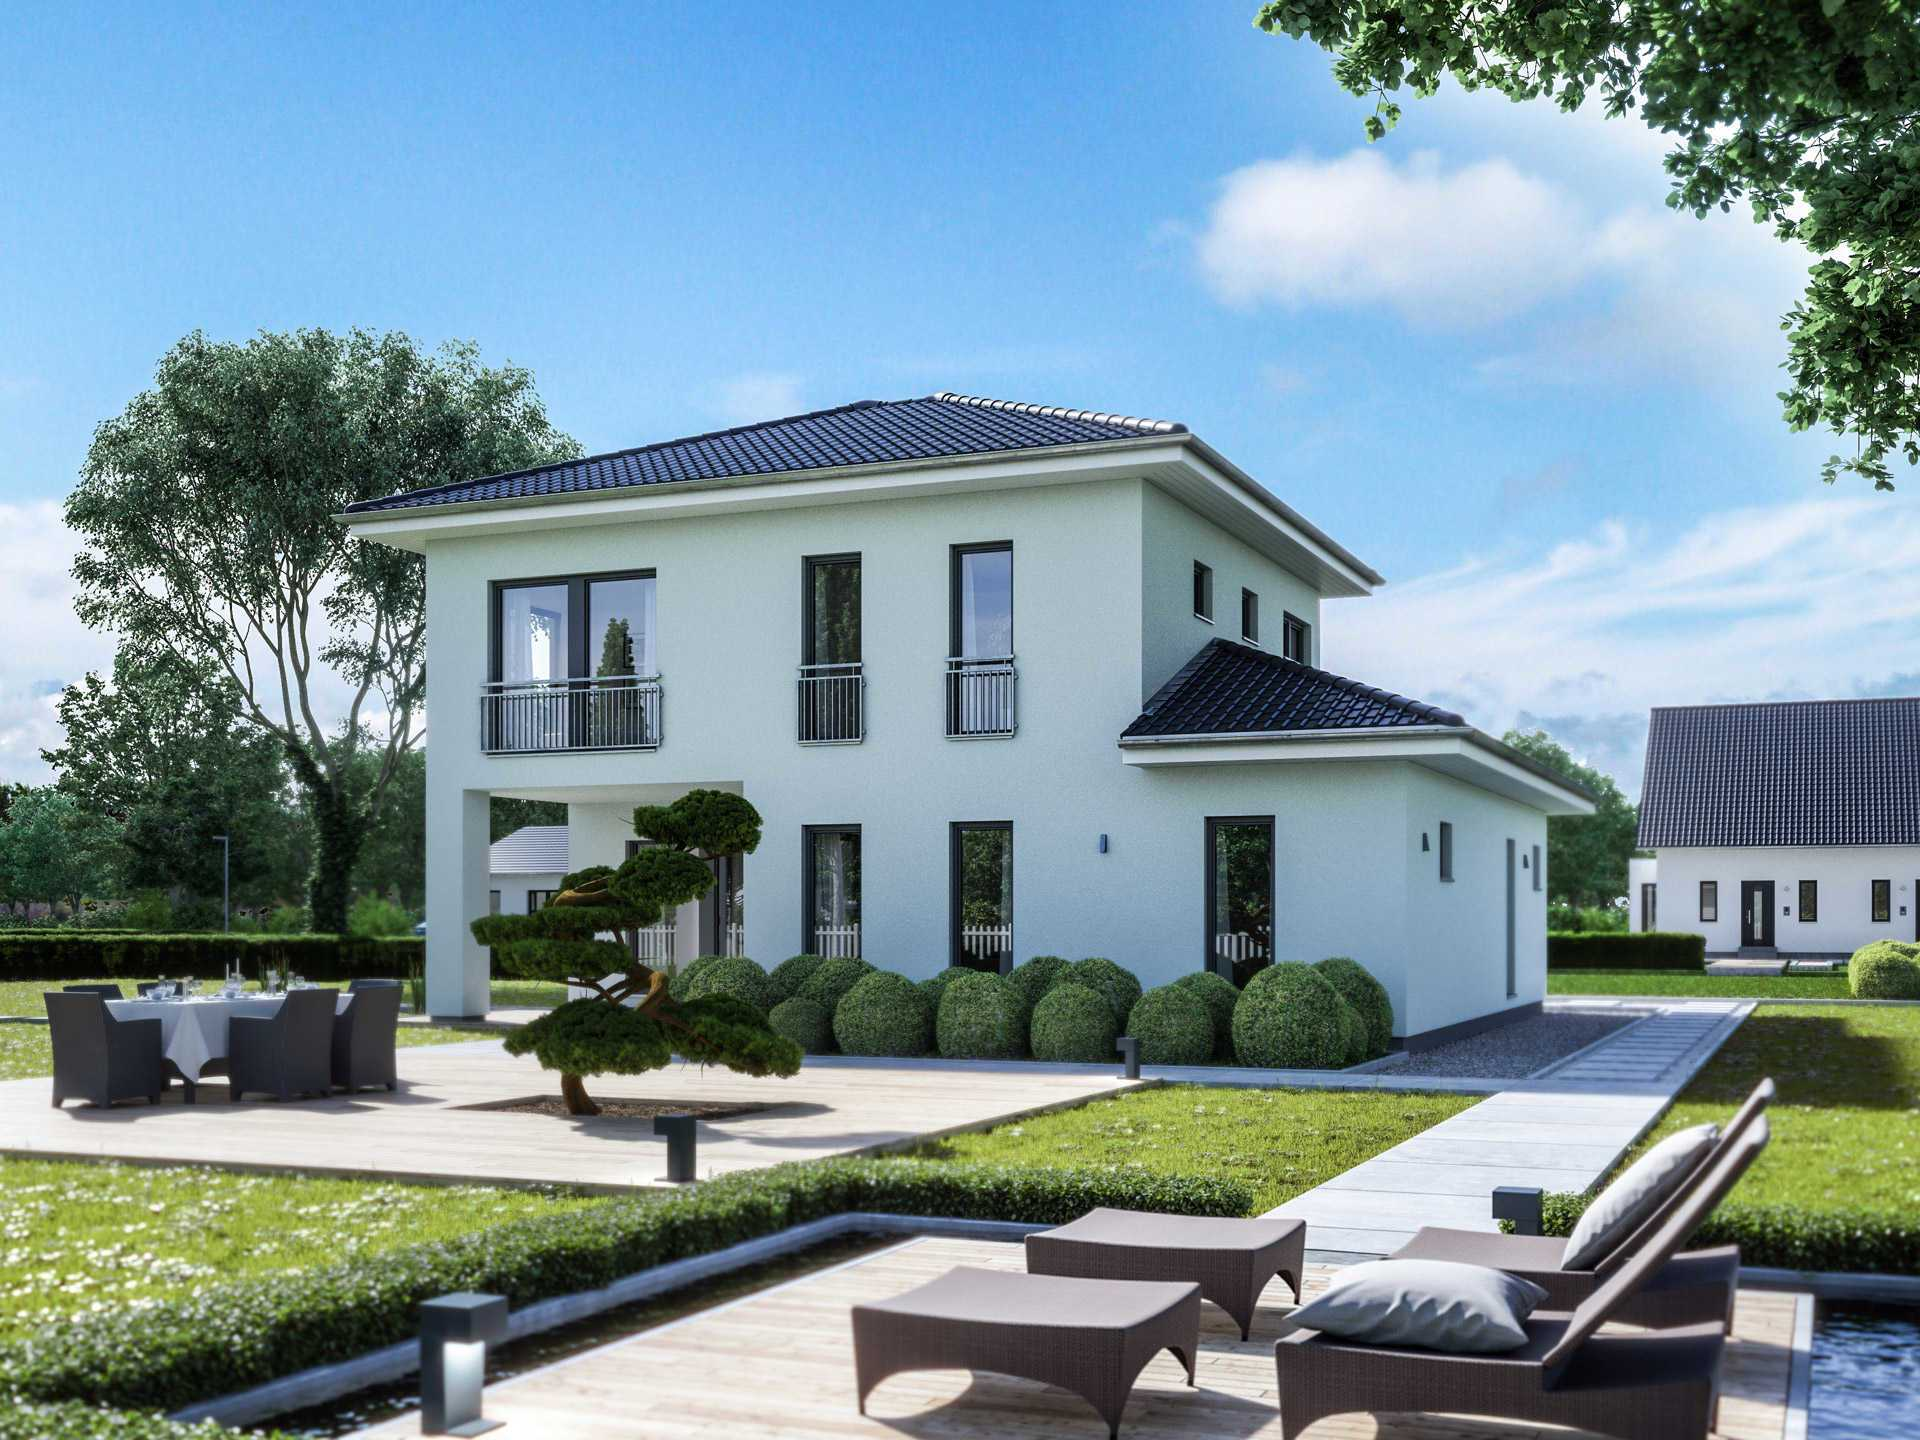 einfamilienhaus city 8 massa haus. Black Bedroom Furniture Sets. Home Design Ideas